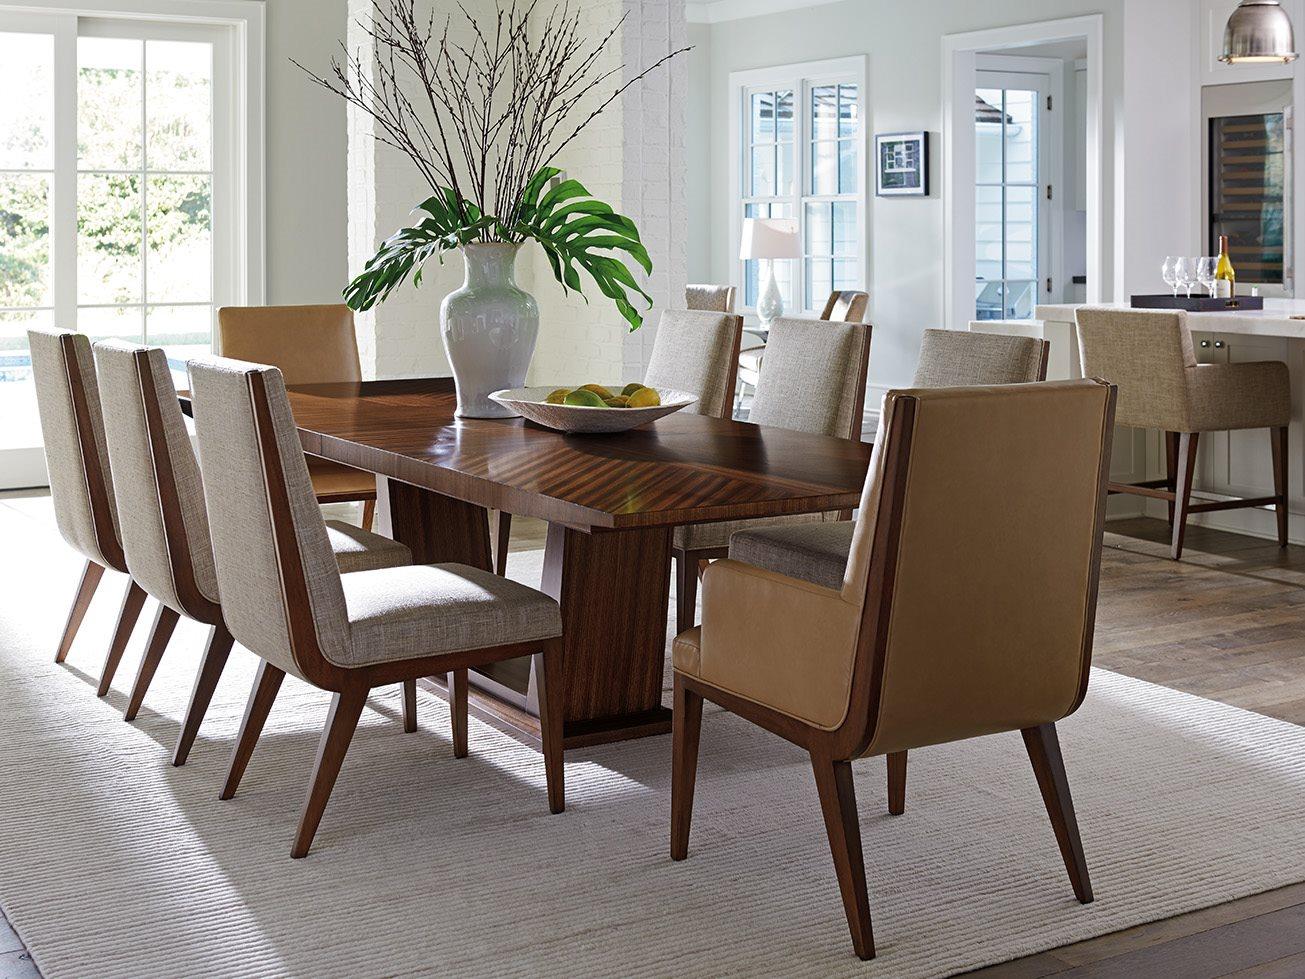 lexington dining room | Lexington Kitano Dining Room Set | LX734877CSET2